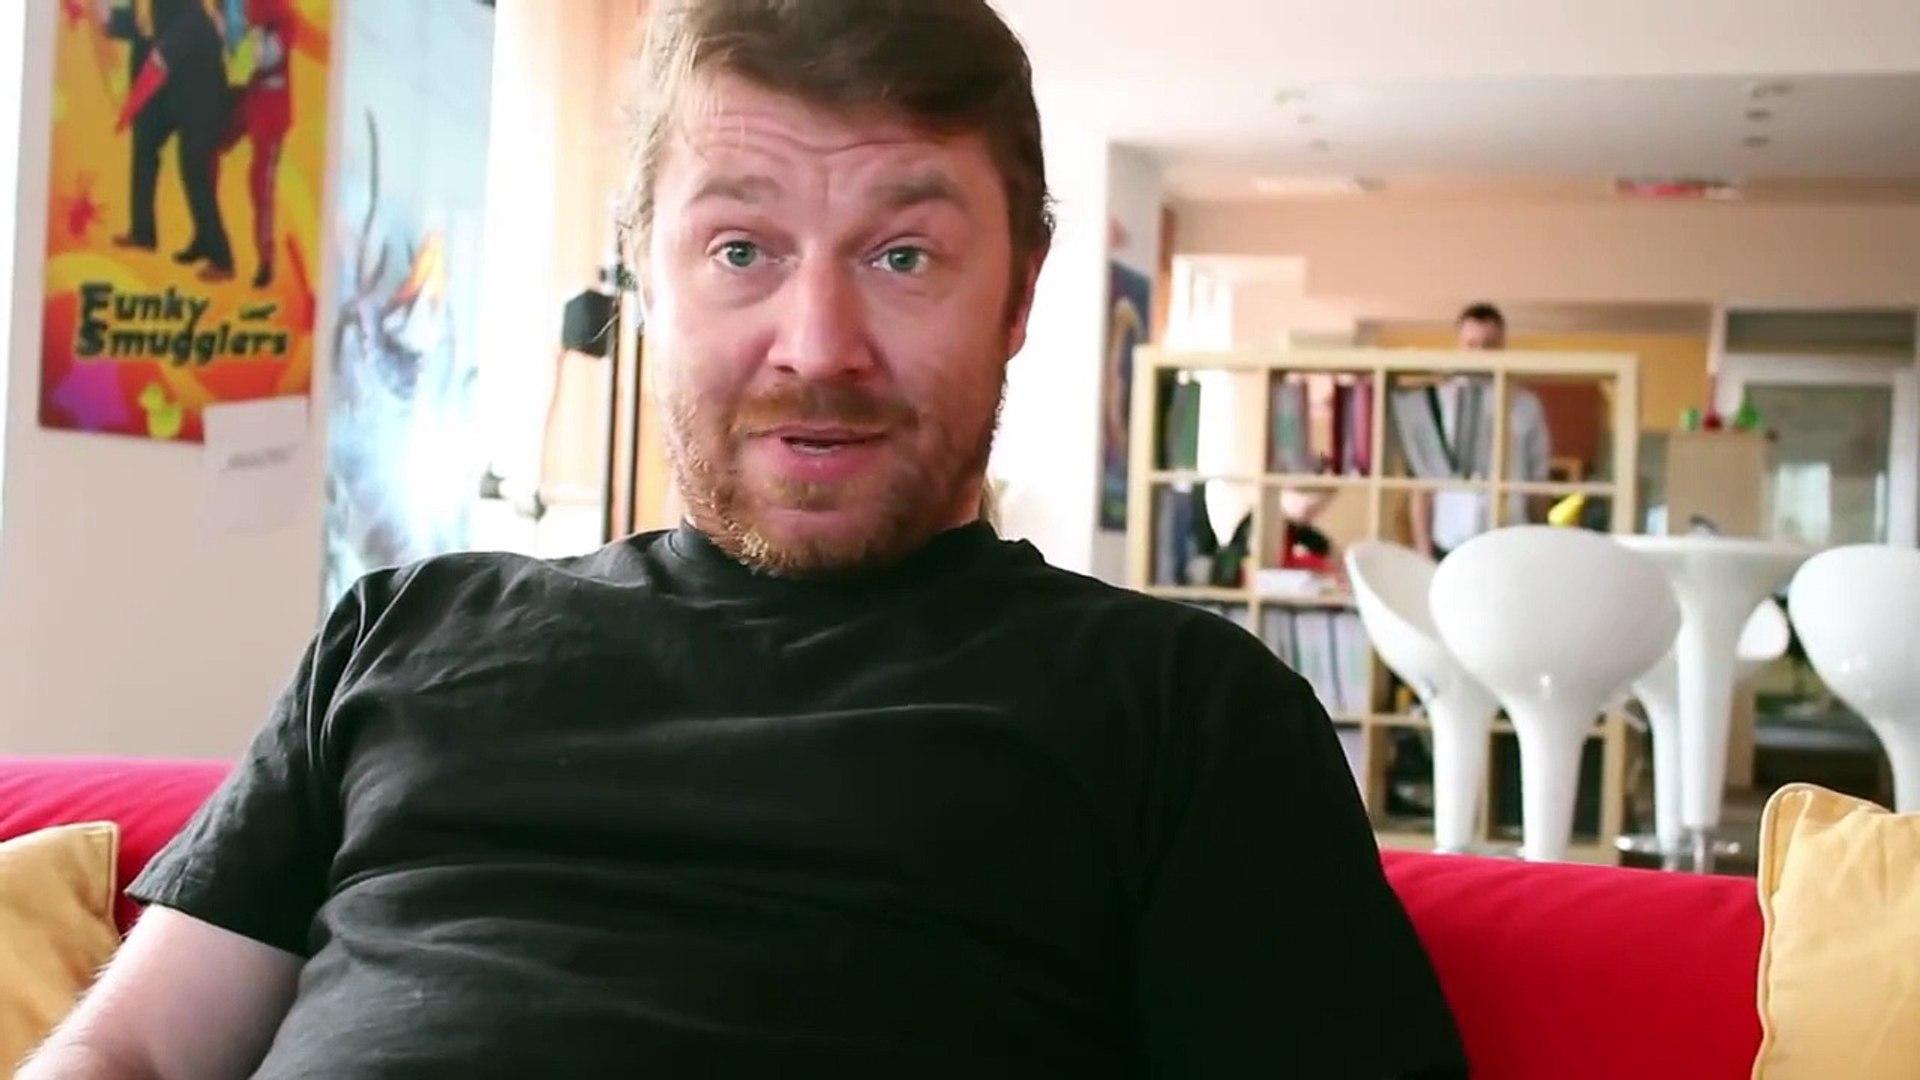 Meet Borys [Anomaly 2 videolog]